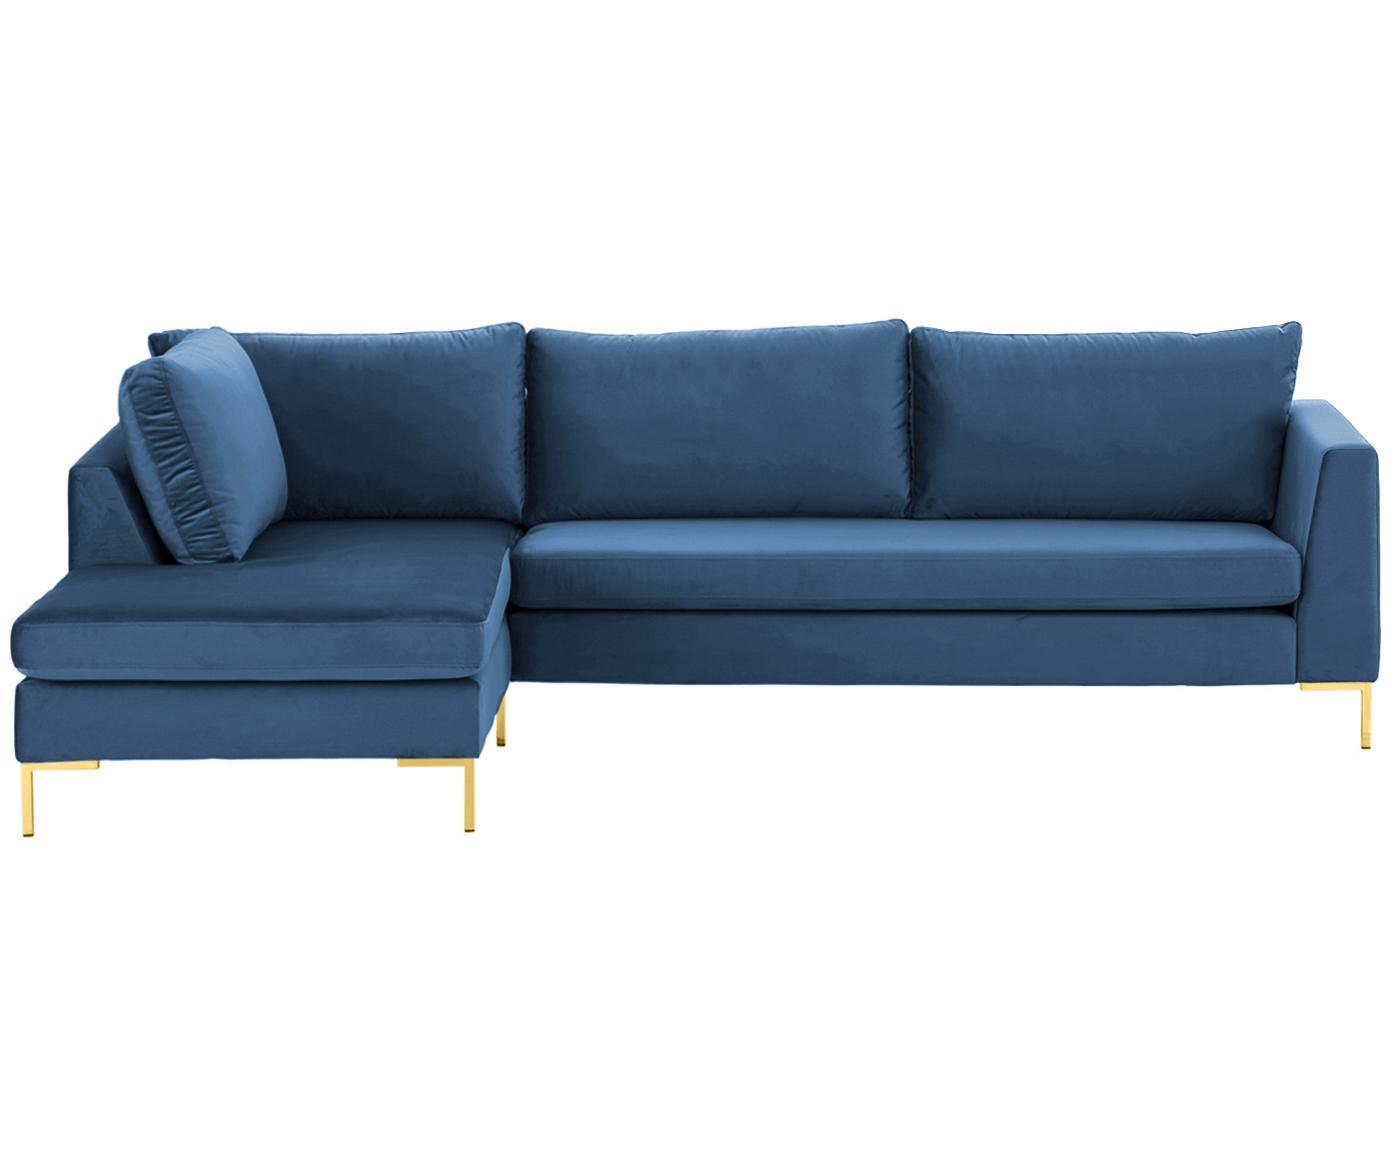 Samt-Ecksofa Luna, Bezug: Samt (Polyester) 80.000 S, Gestell: Massives Buchenholz, Füße: Metall, galvanisiert, Samt Blau, Gold, B 280 x T 184 cm